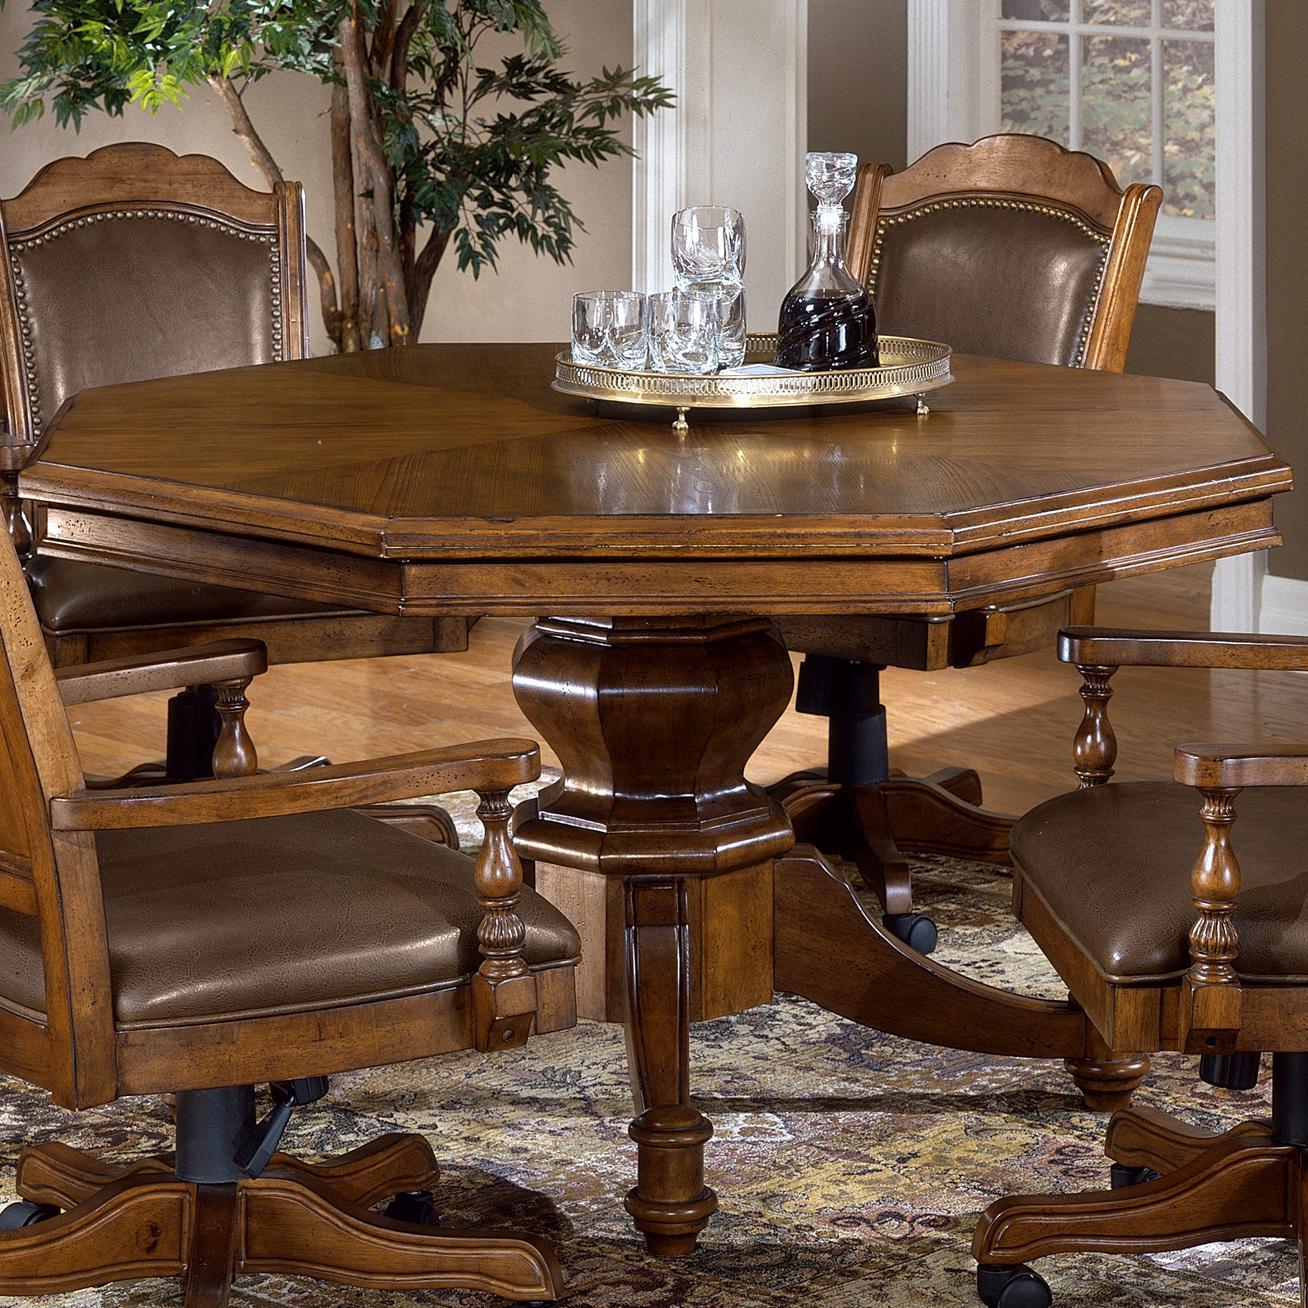 Hillsdale Nassau Nassau Game Table - Item Number: 6060-810+811